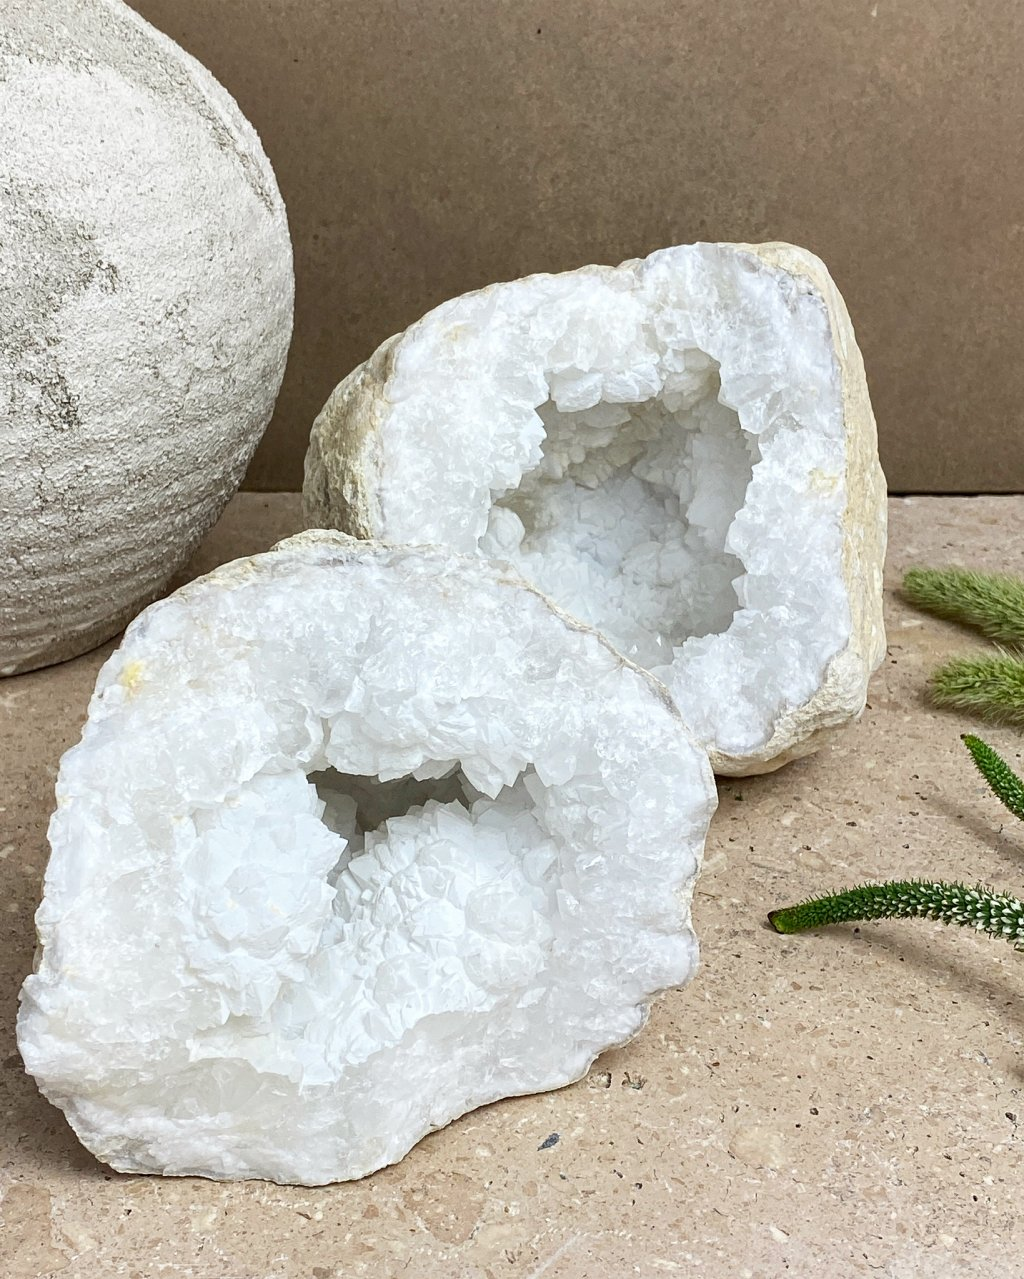 Křišťál geoda maxi Maroko 20cm 3,6g